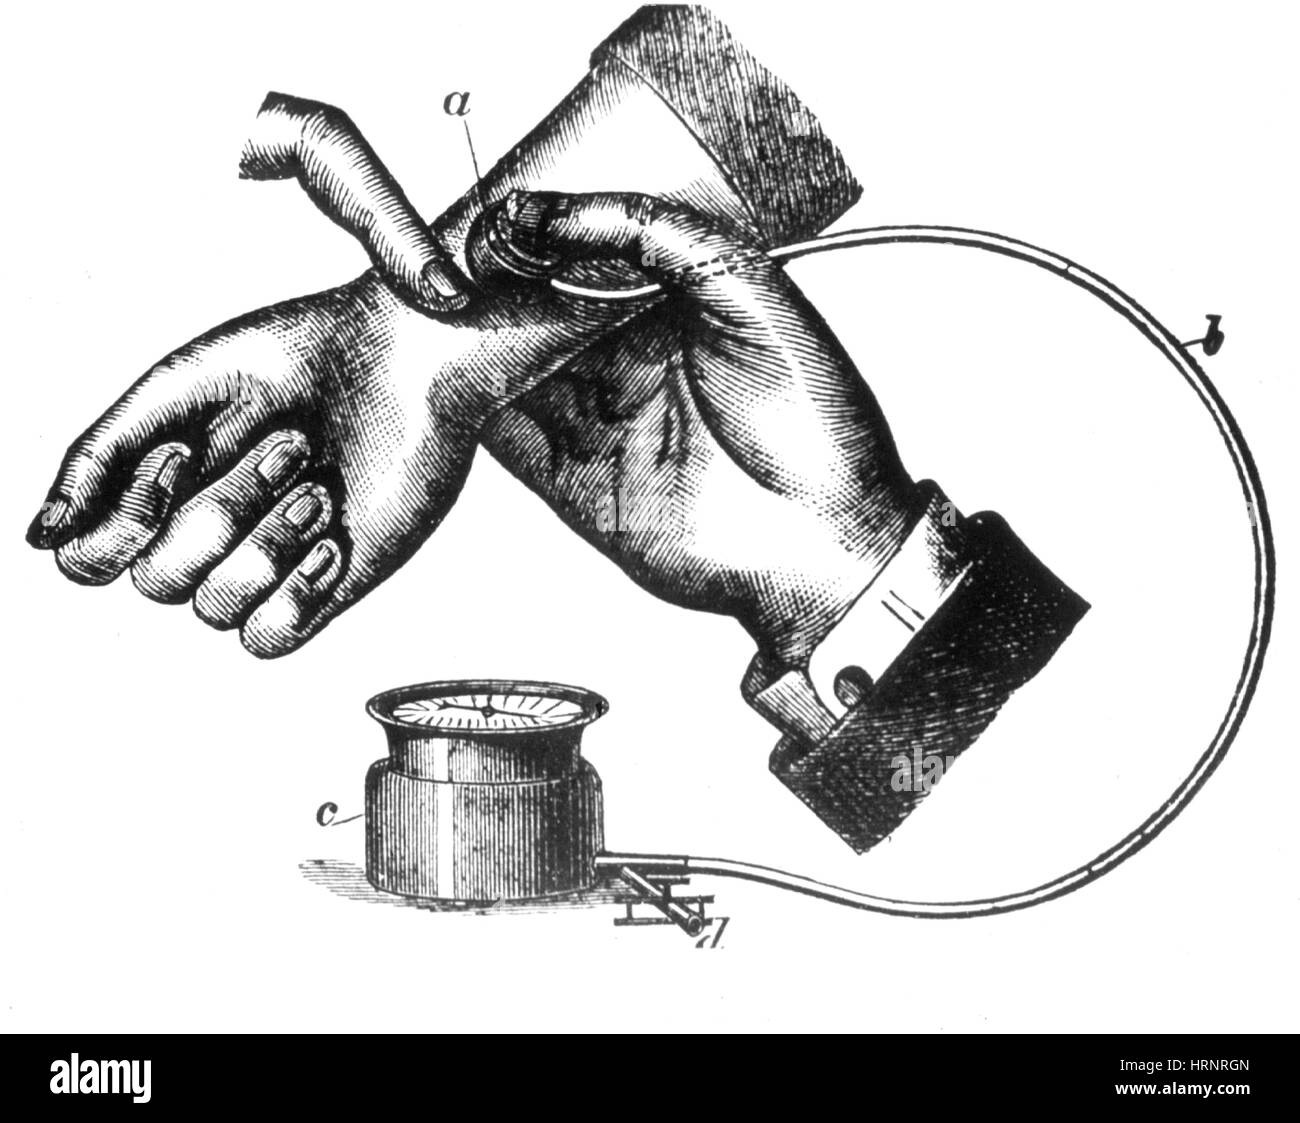 Sphygmomanometer, 1883 - Stock Image